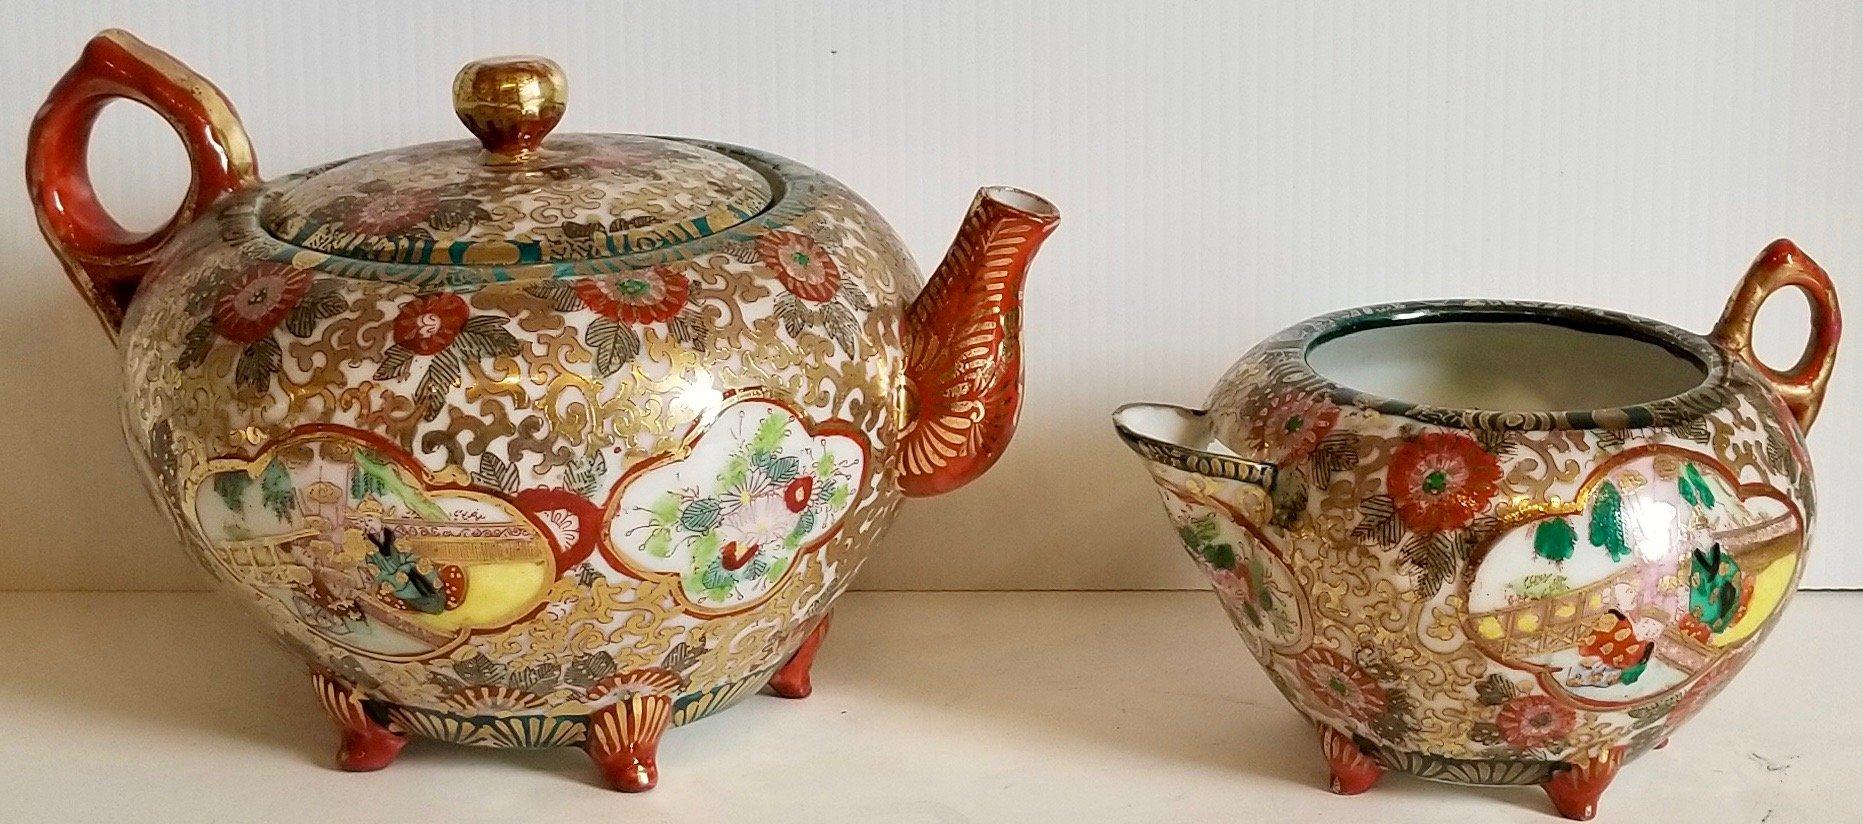 Chinese porcelain tea pot and porcelain creamer pot